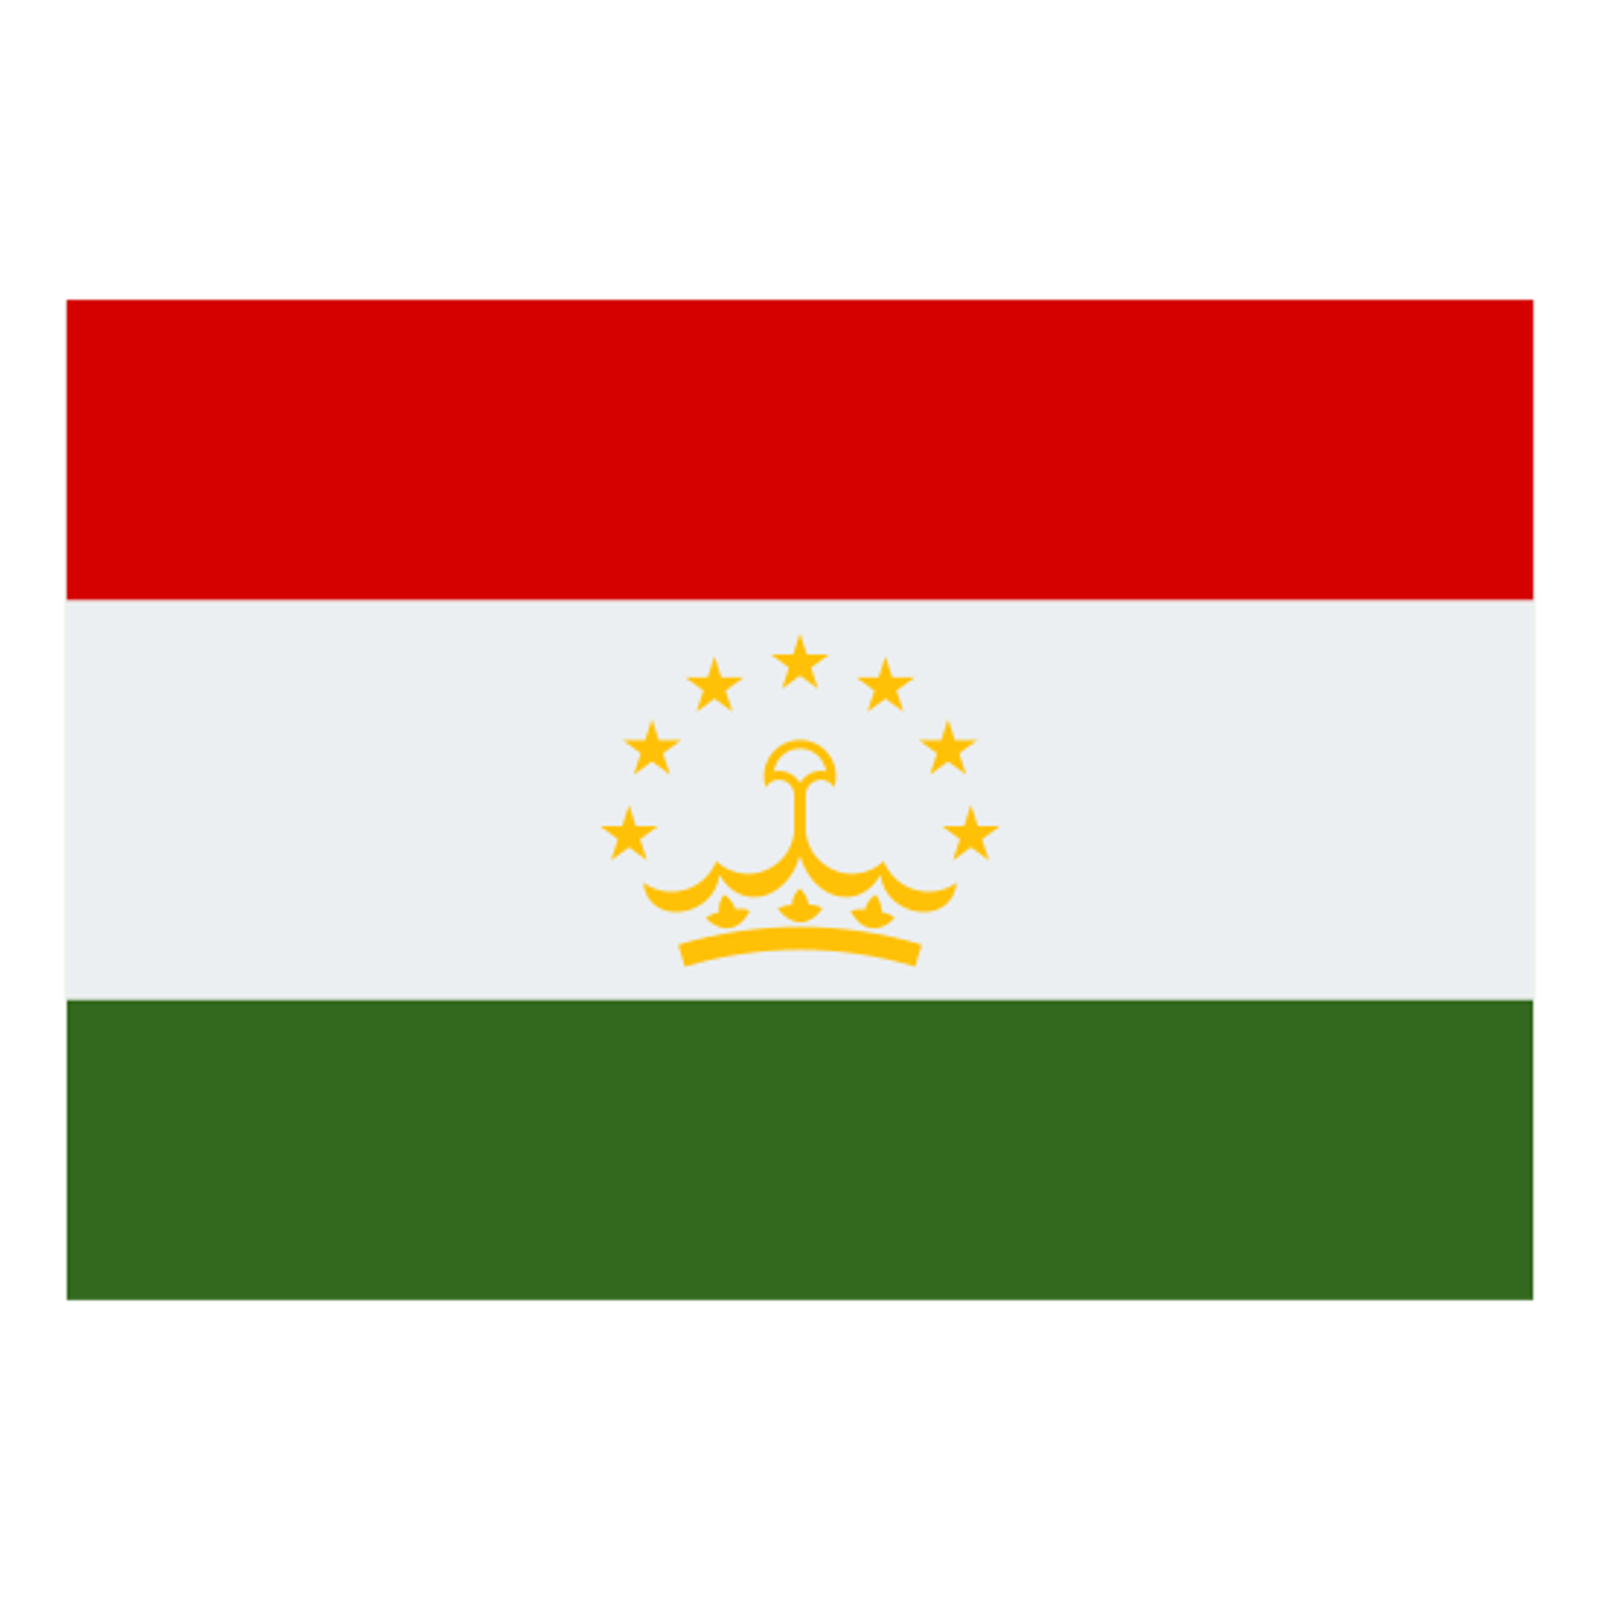 塔吉克斯坦 icon